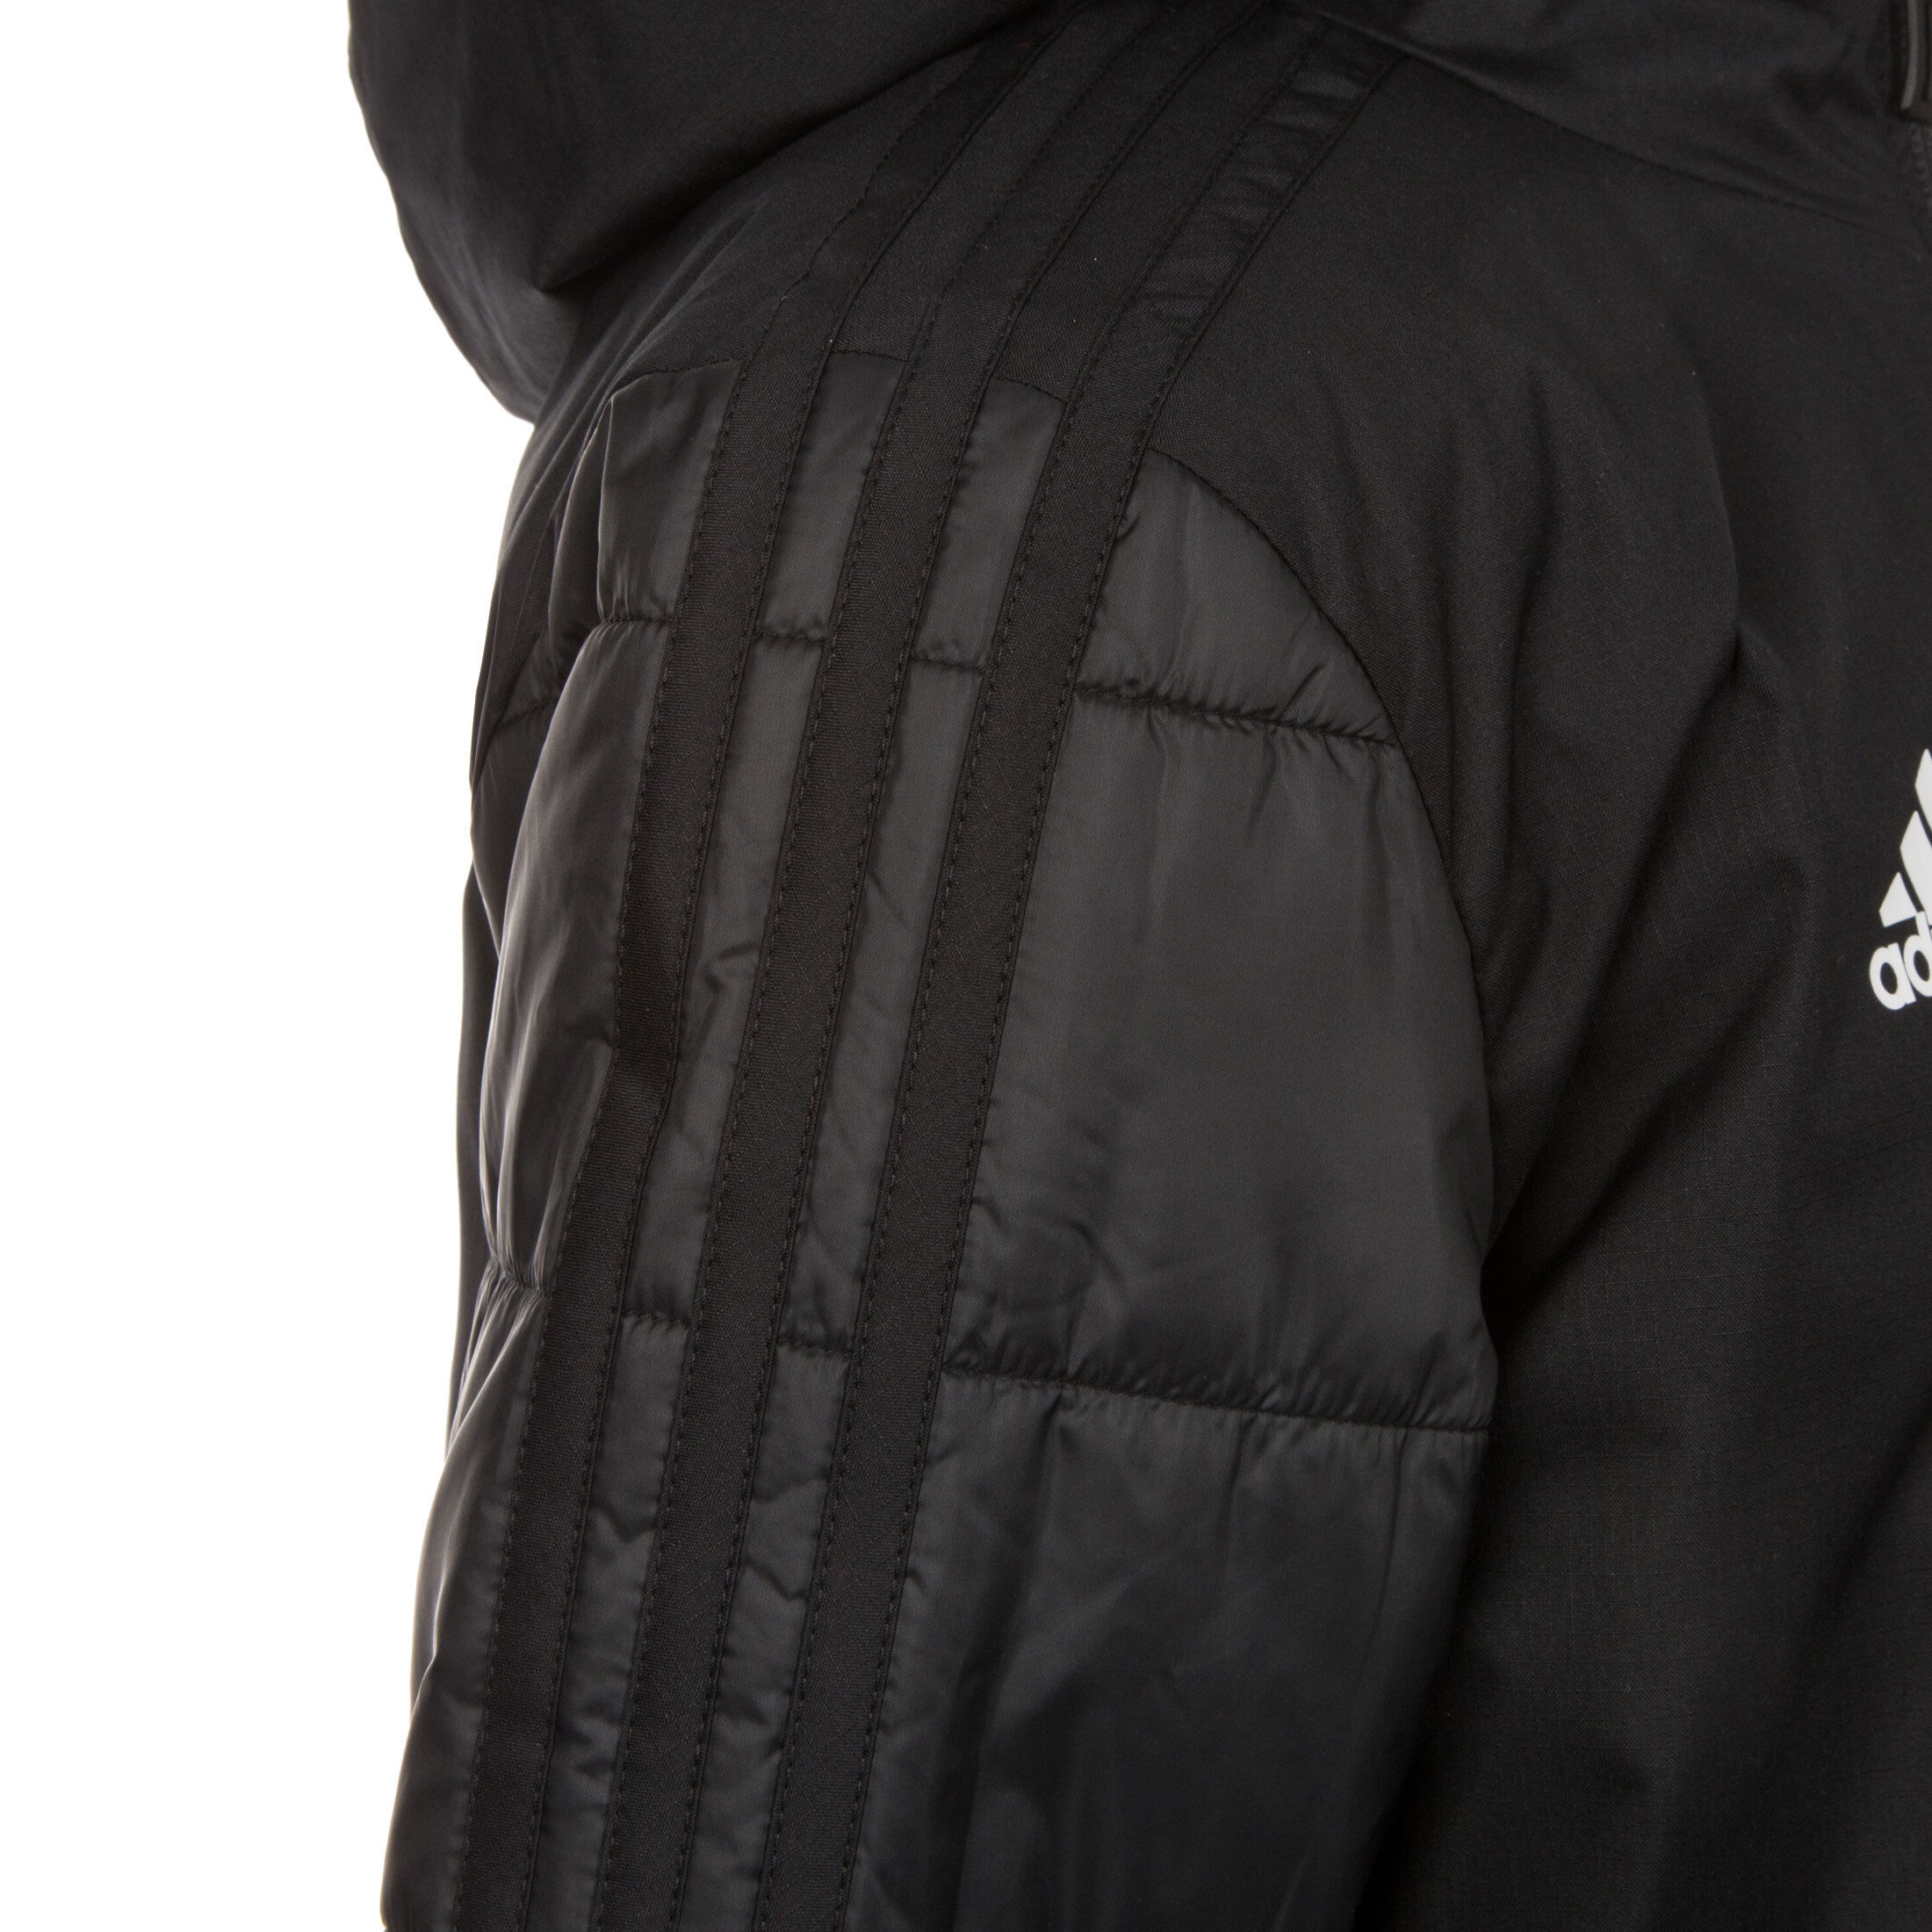 18 Jacken Kinder Winter Condivo Adidas Jacke Igm6y7Ybfv